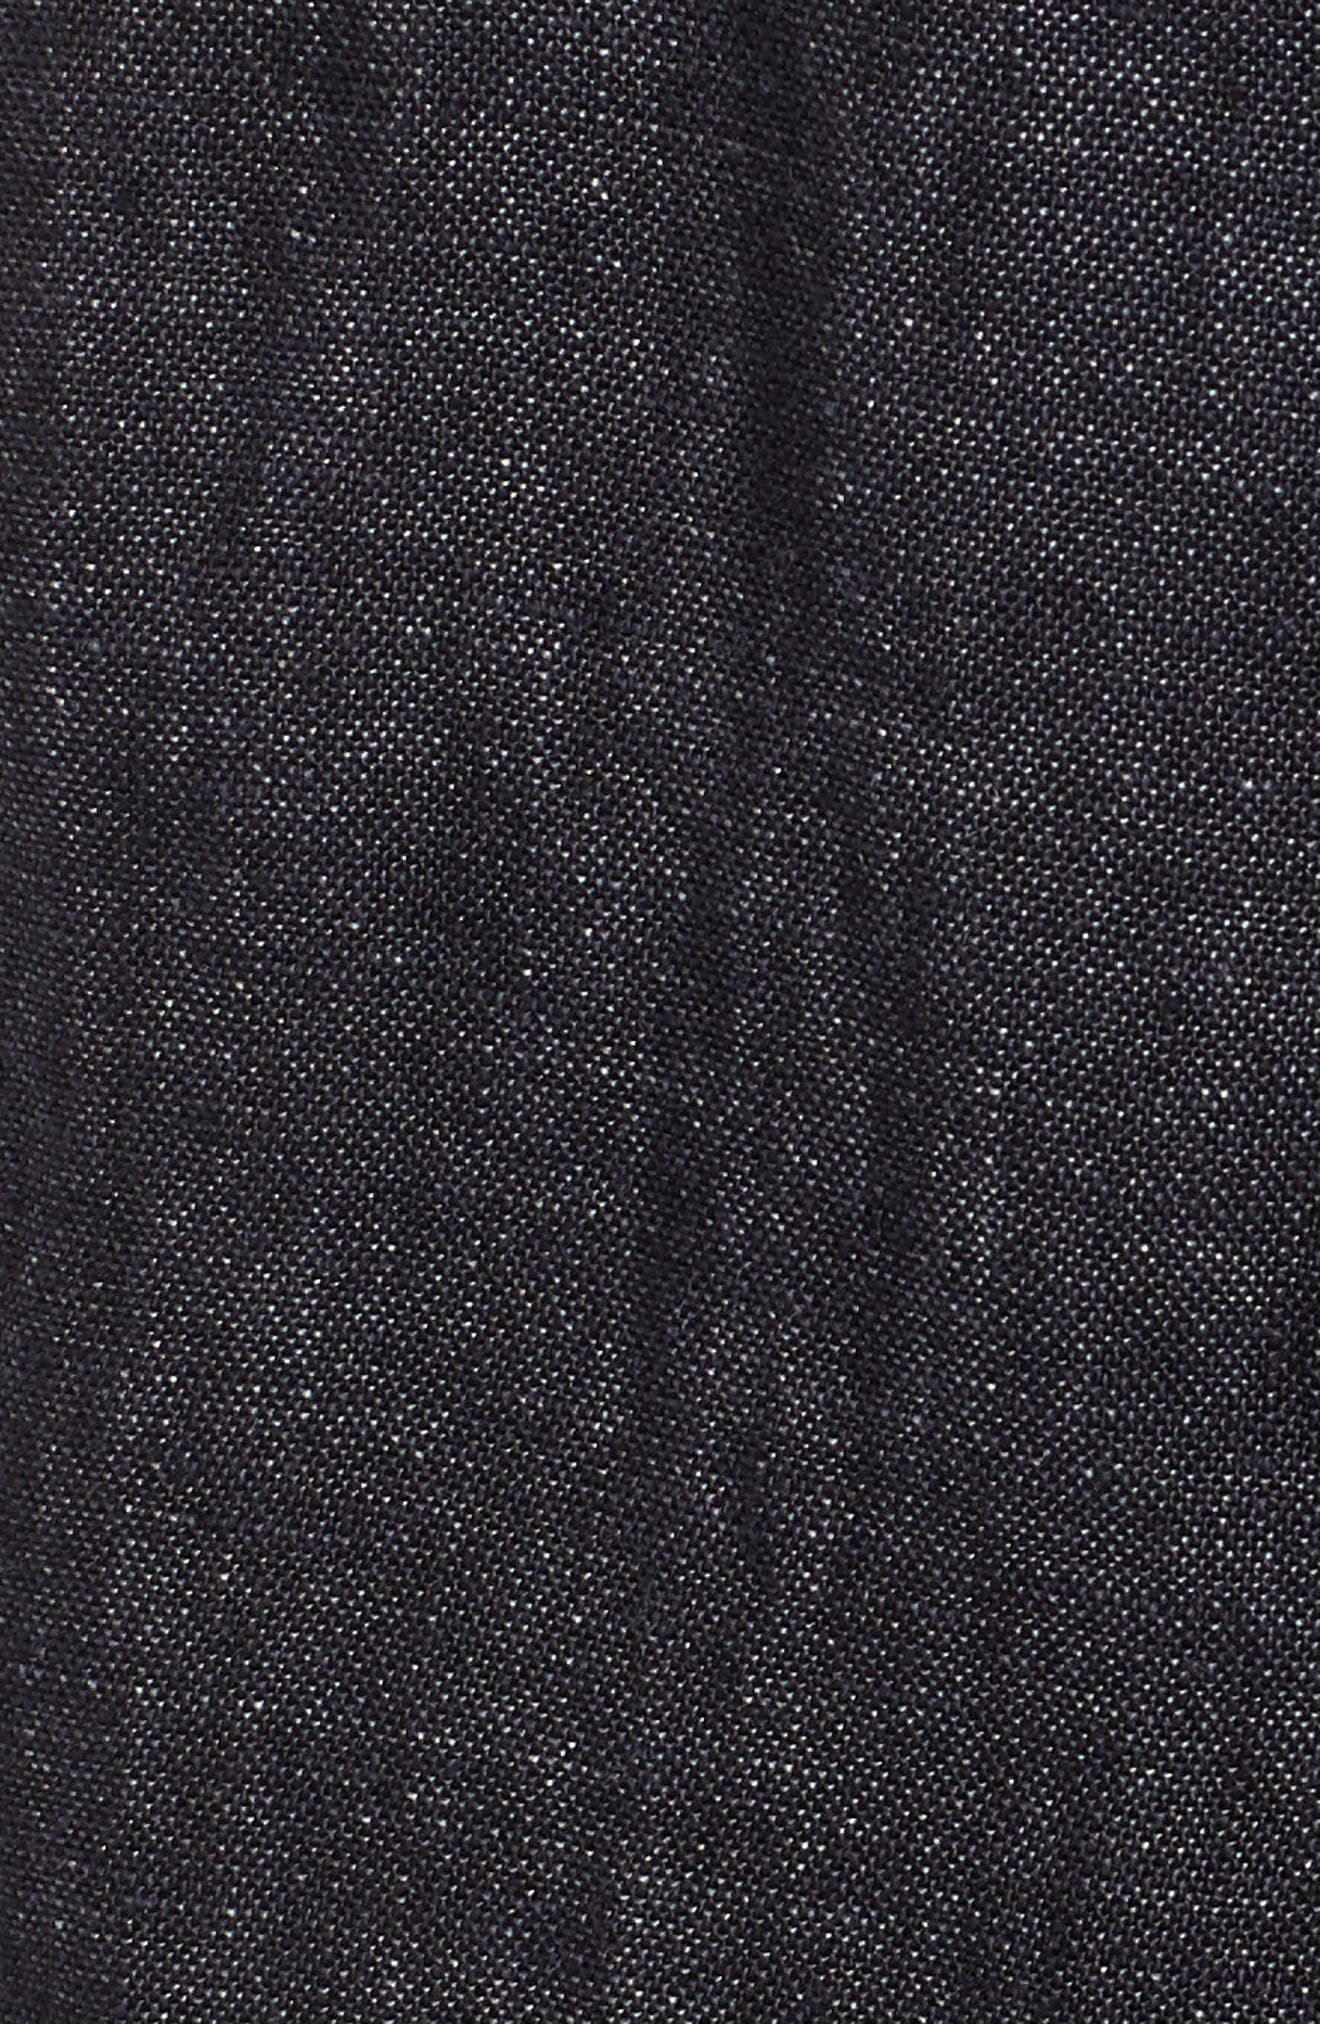 Easy Ankle Organic Linen Pants,                             Alternate thumbnail 6, color,                             080